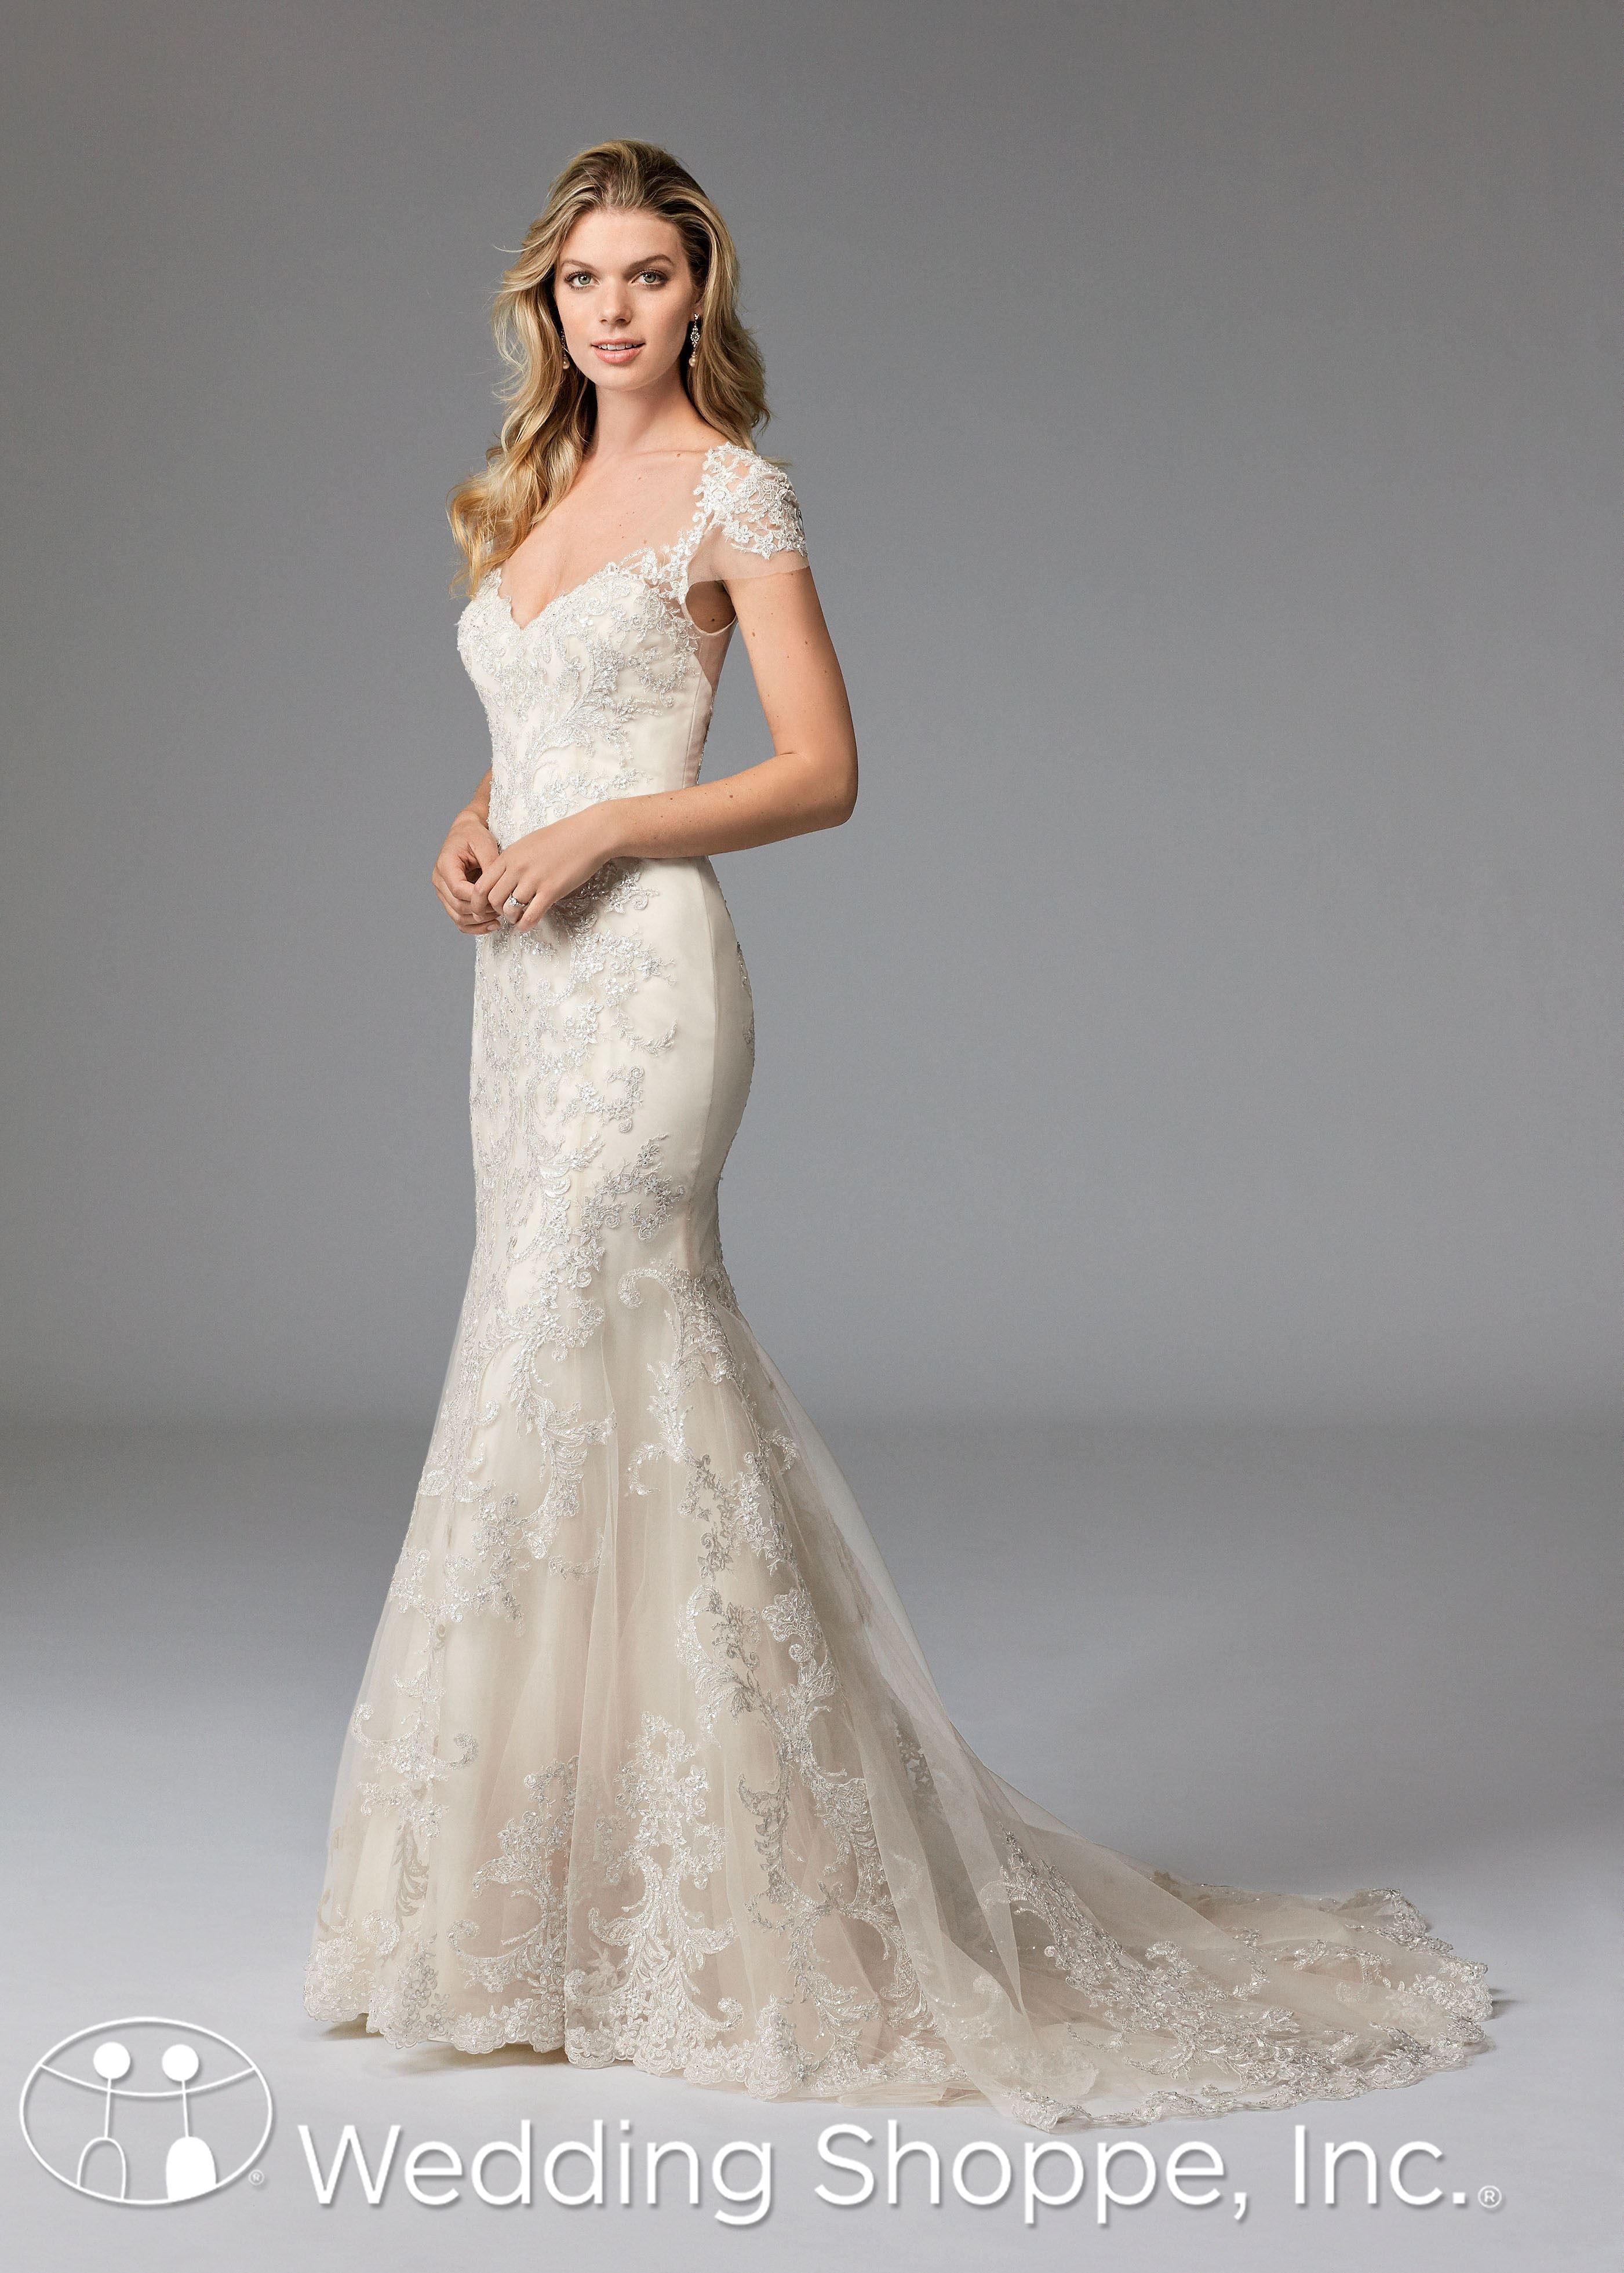 Discontinued Product Bridal dresses, Bridal wedding